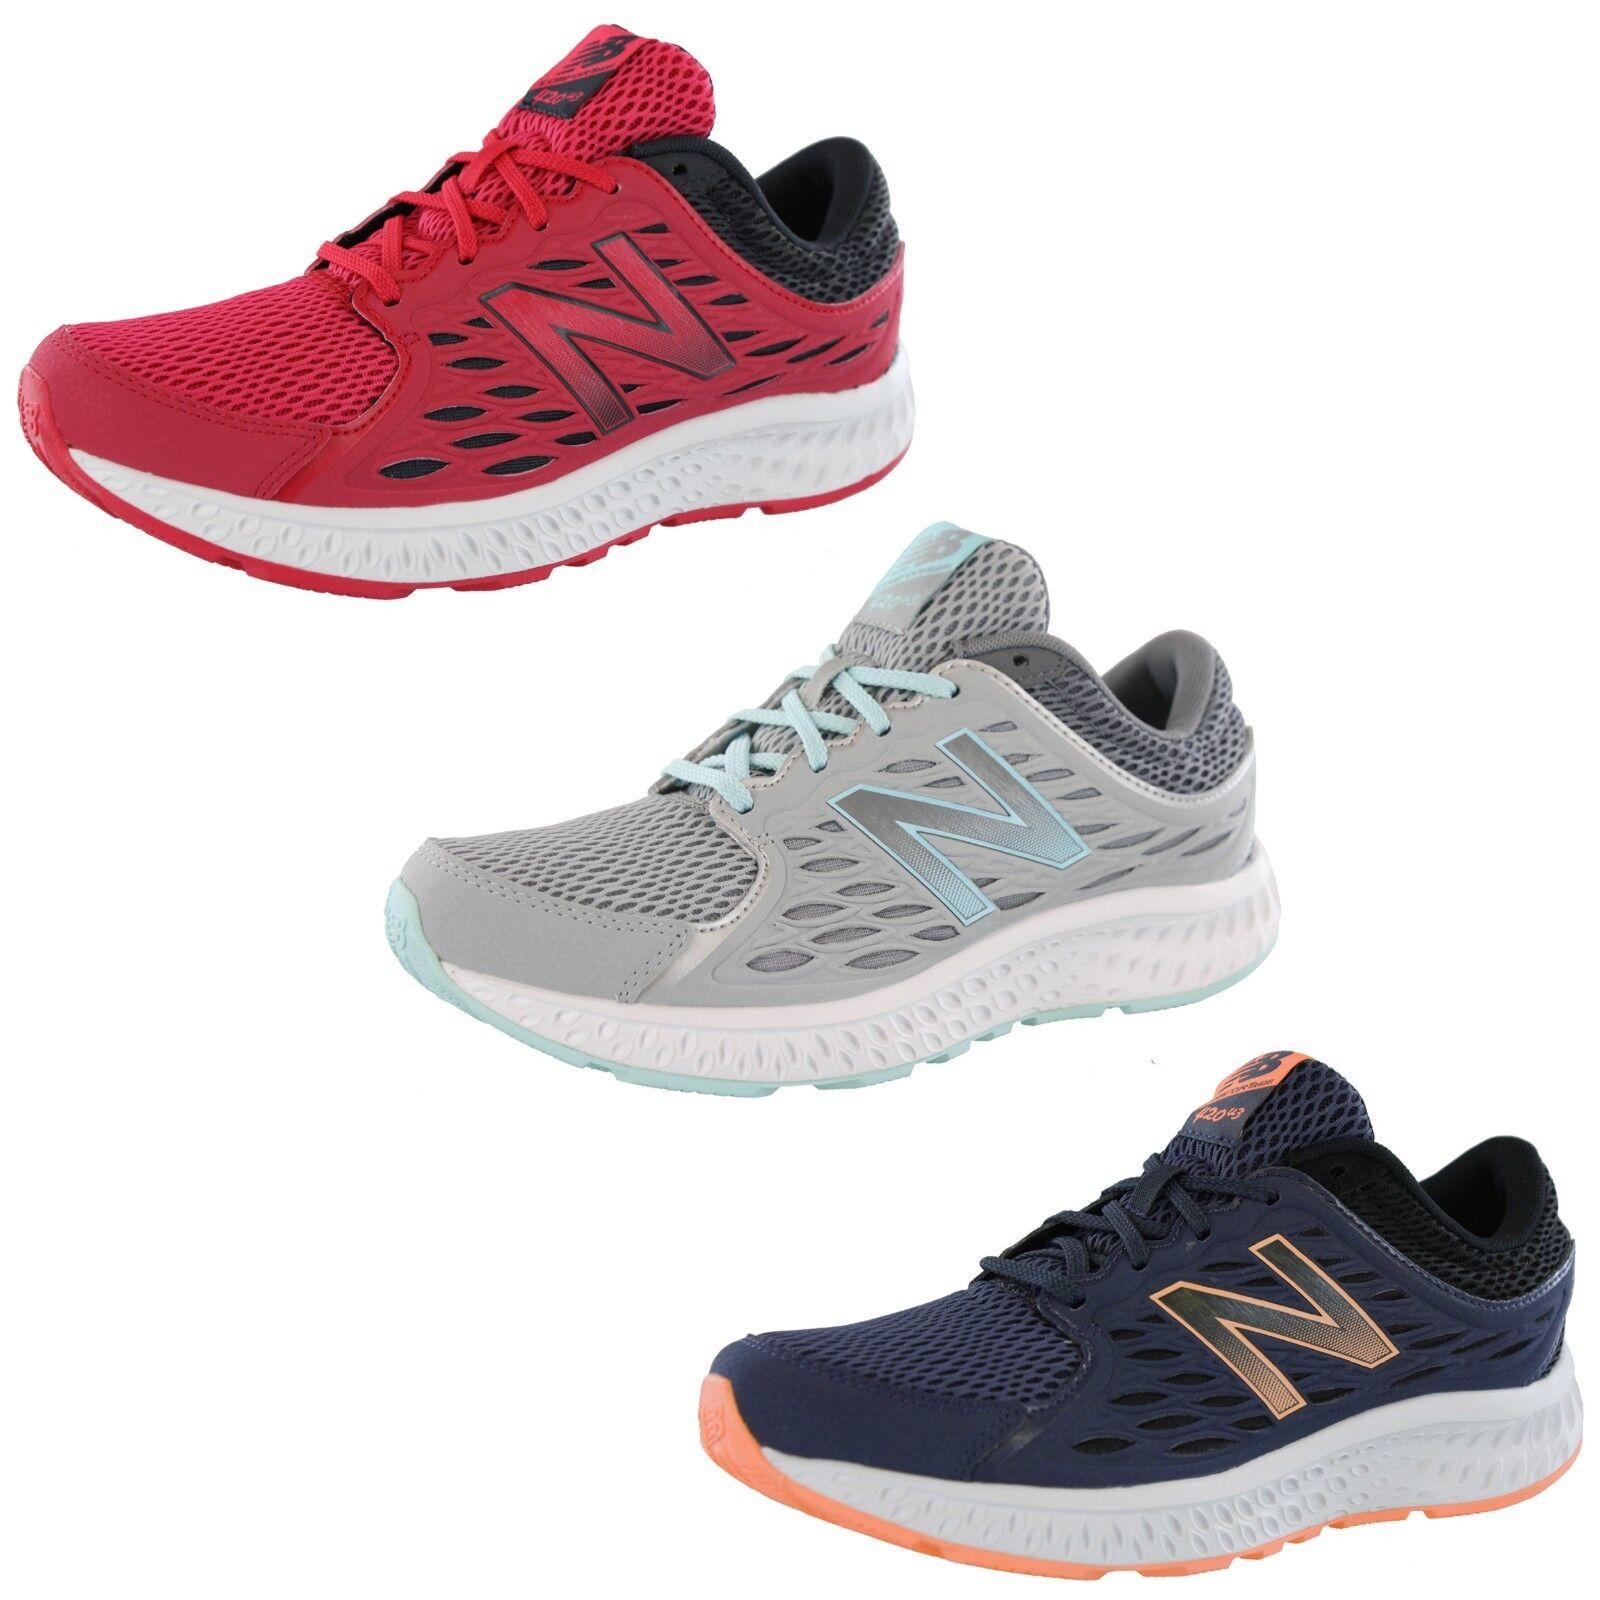 NEW BALANCE BALANCE NEW Damenschuhe W420 RUNNING Schuhe 167979